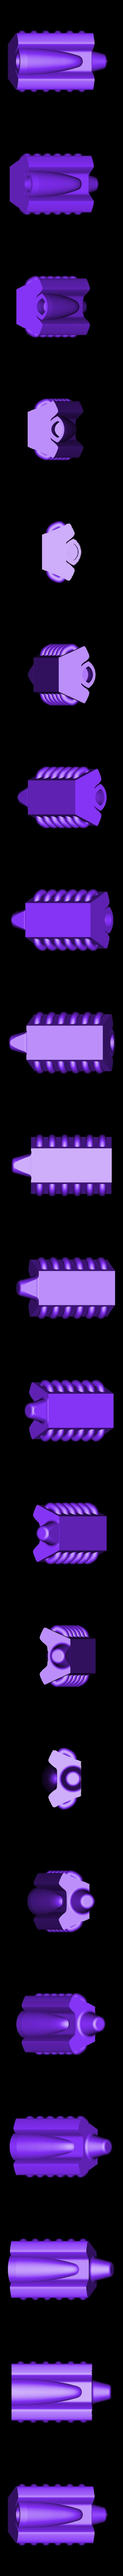 DF XDerby SciFi Engine.stl Download free STL file Dreamfactory XDerby • 3D printer template, yanizo